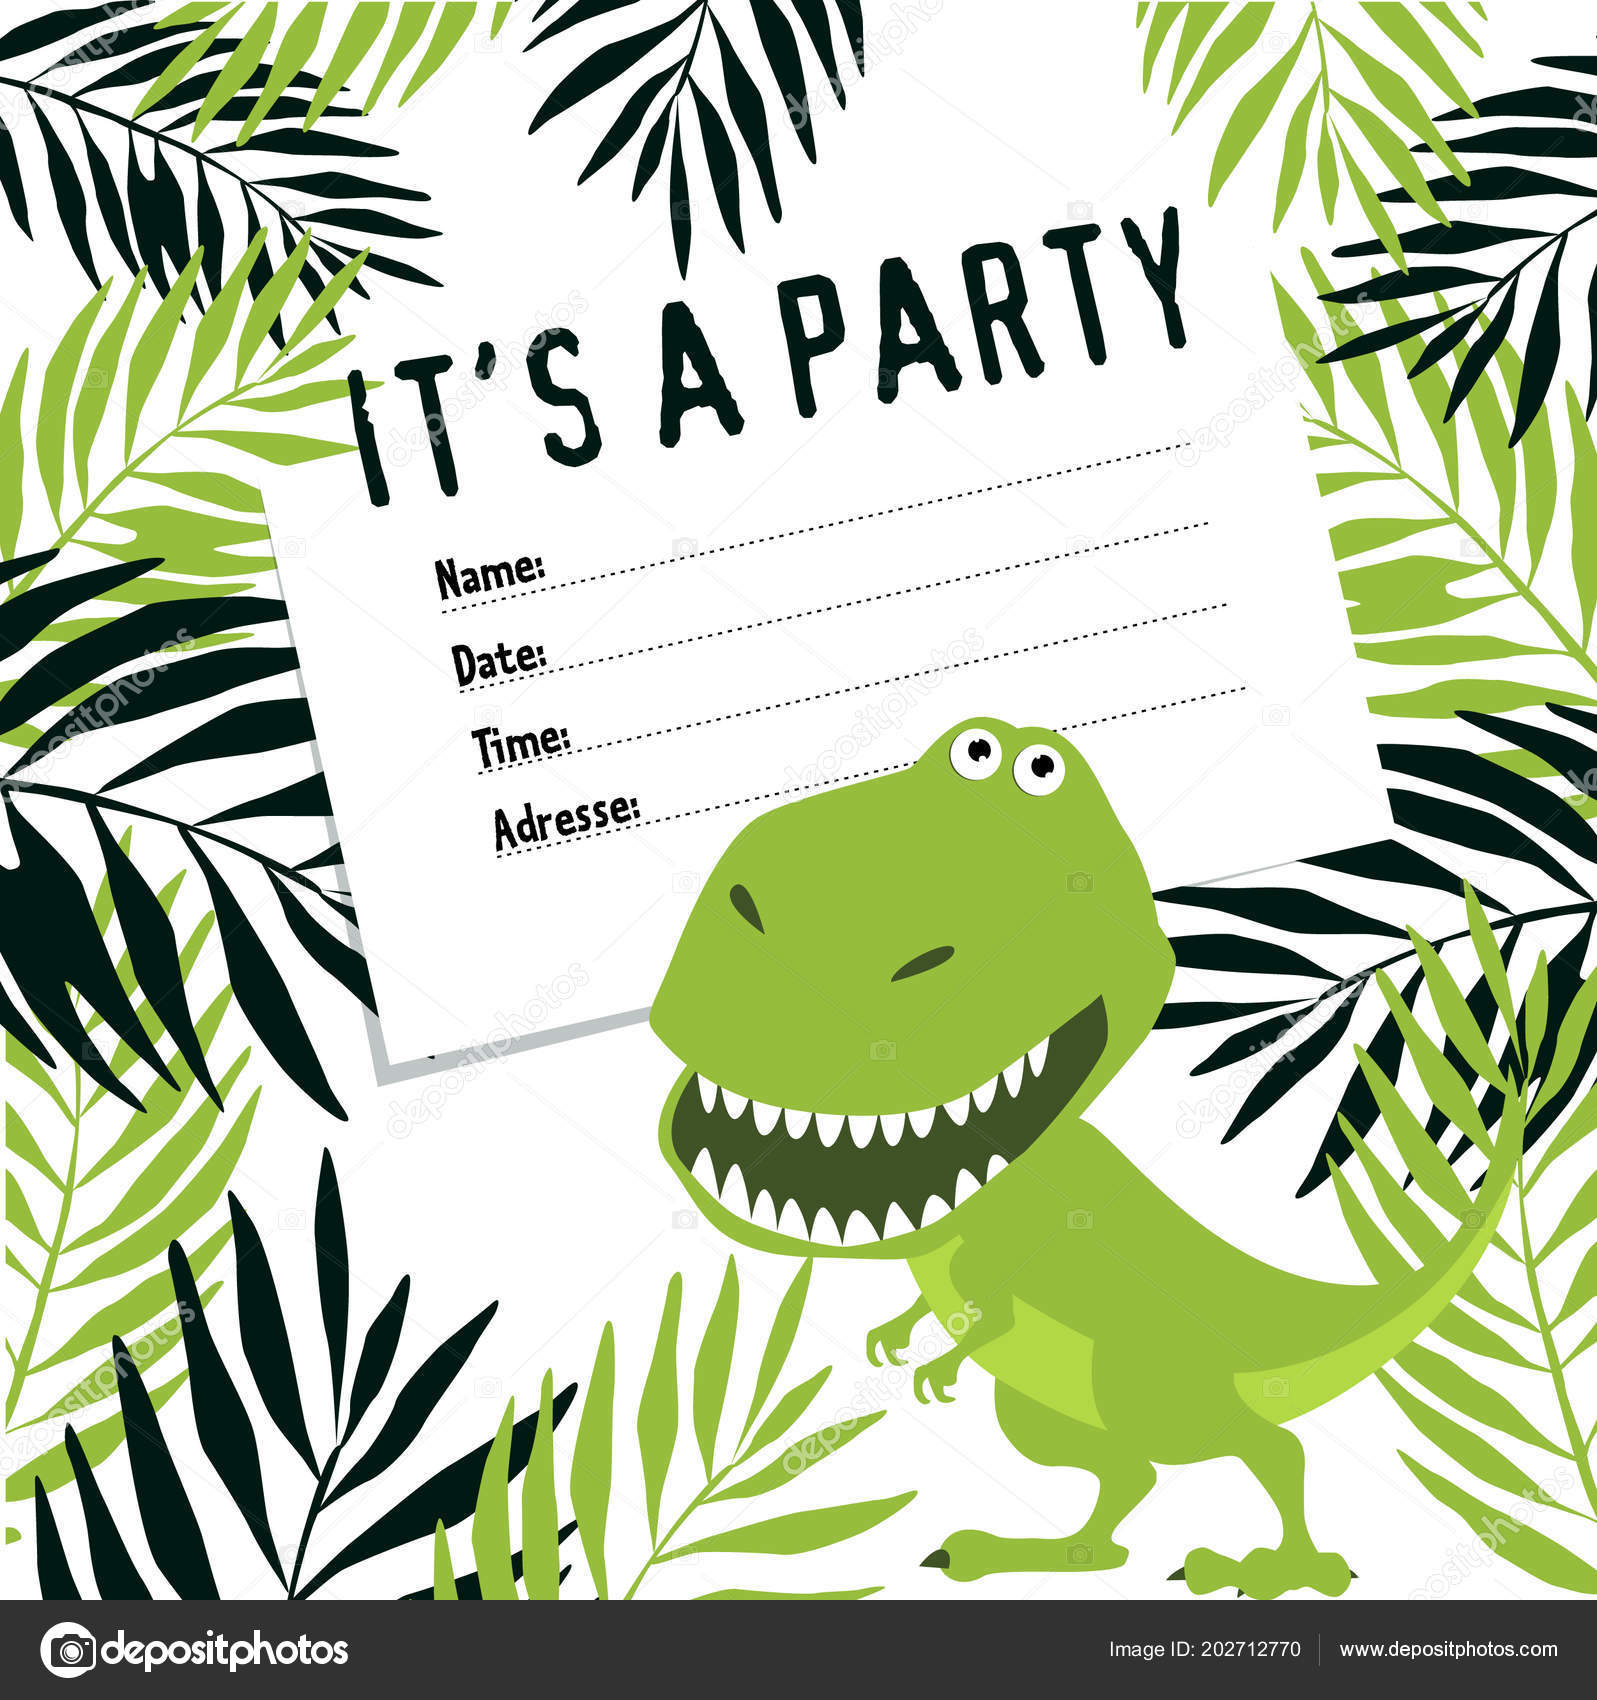 Invitation Party Dinosaurs Birthday Cartoon Funny Dinosaur ...